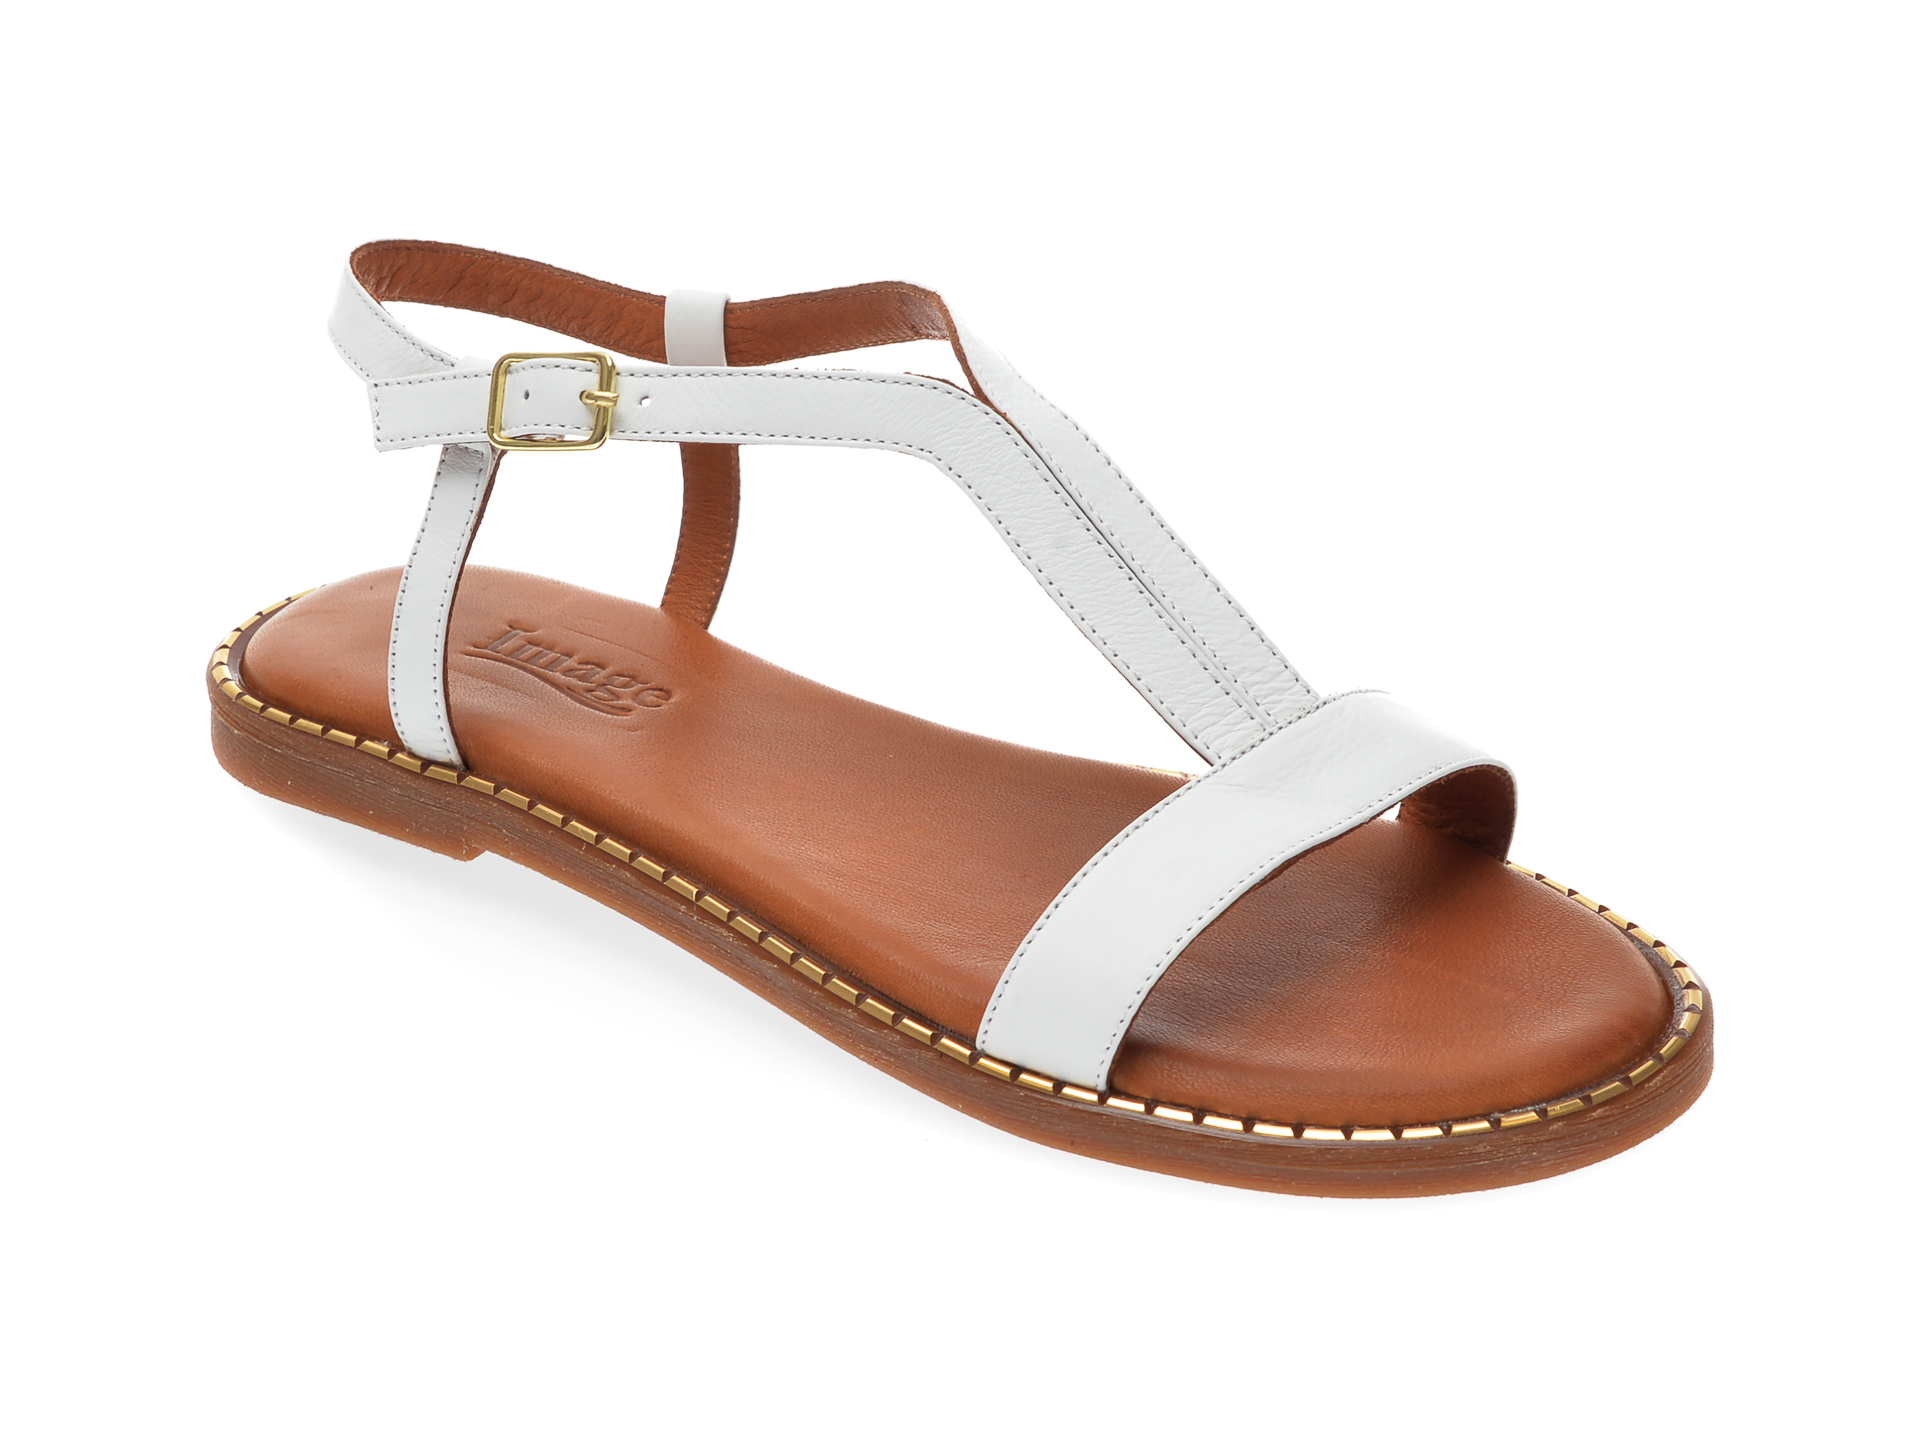 Sandale IMAGE albe, 701, din piele naturala imagine otter.ro